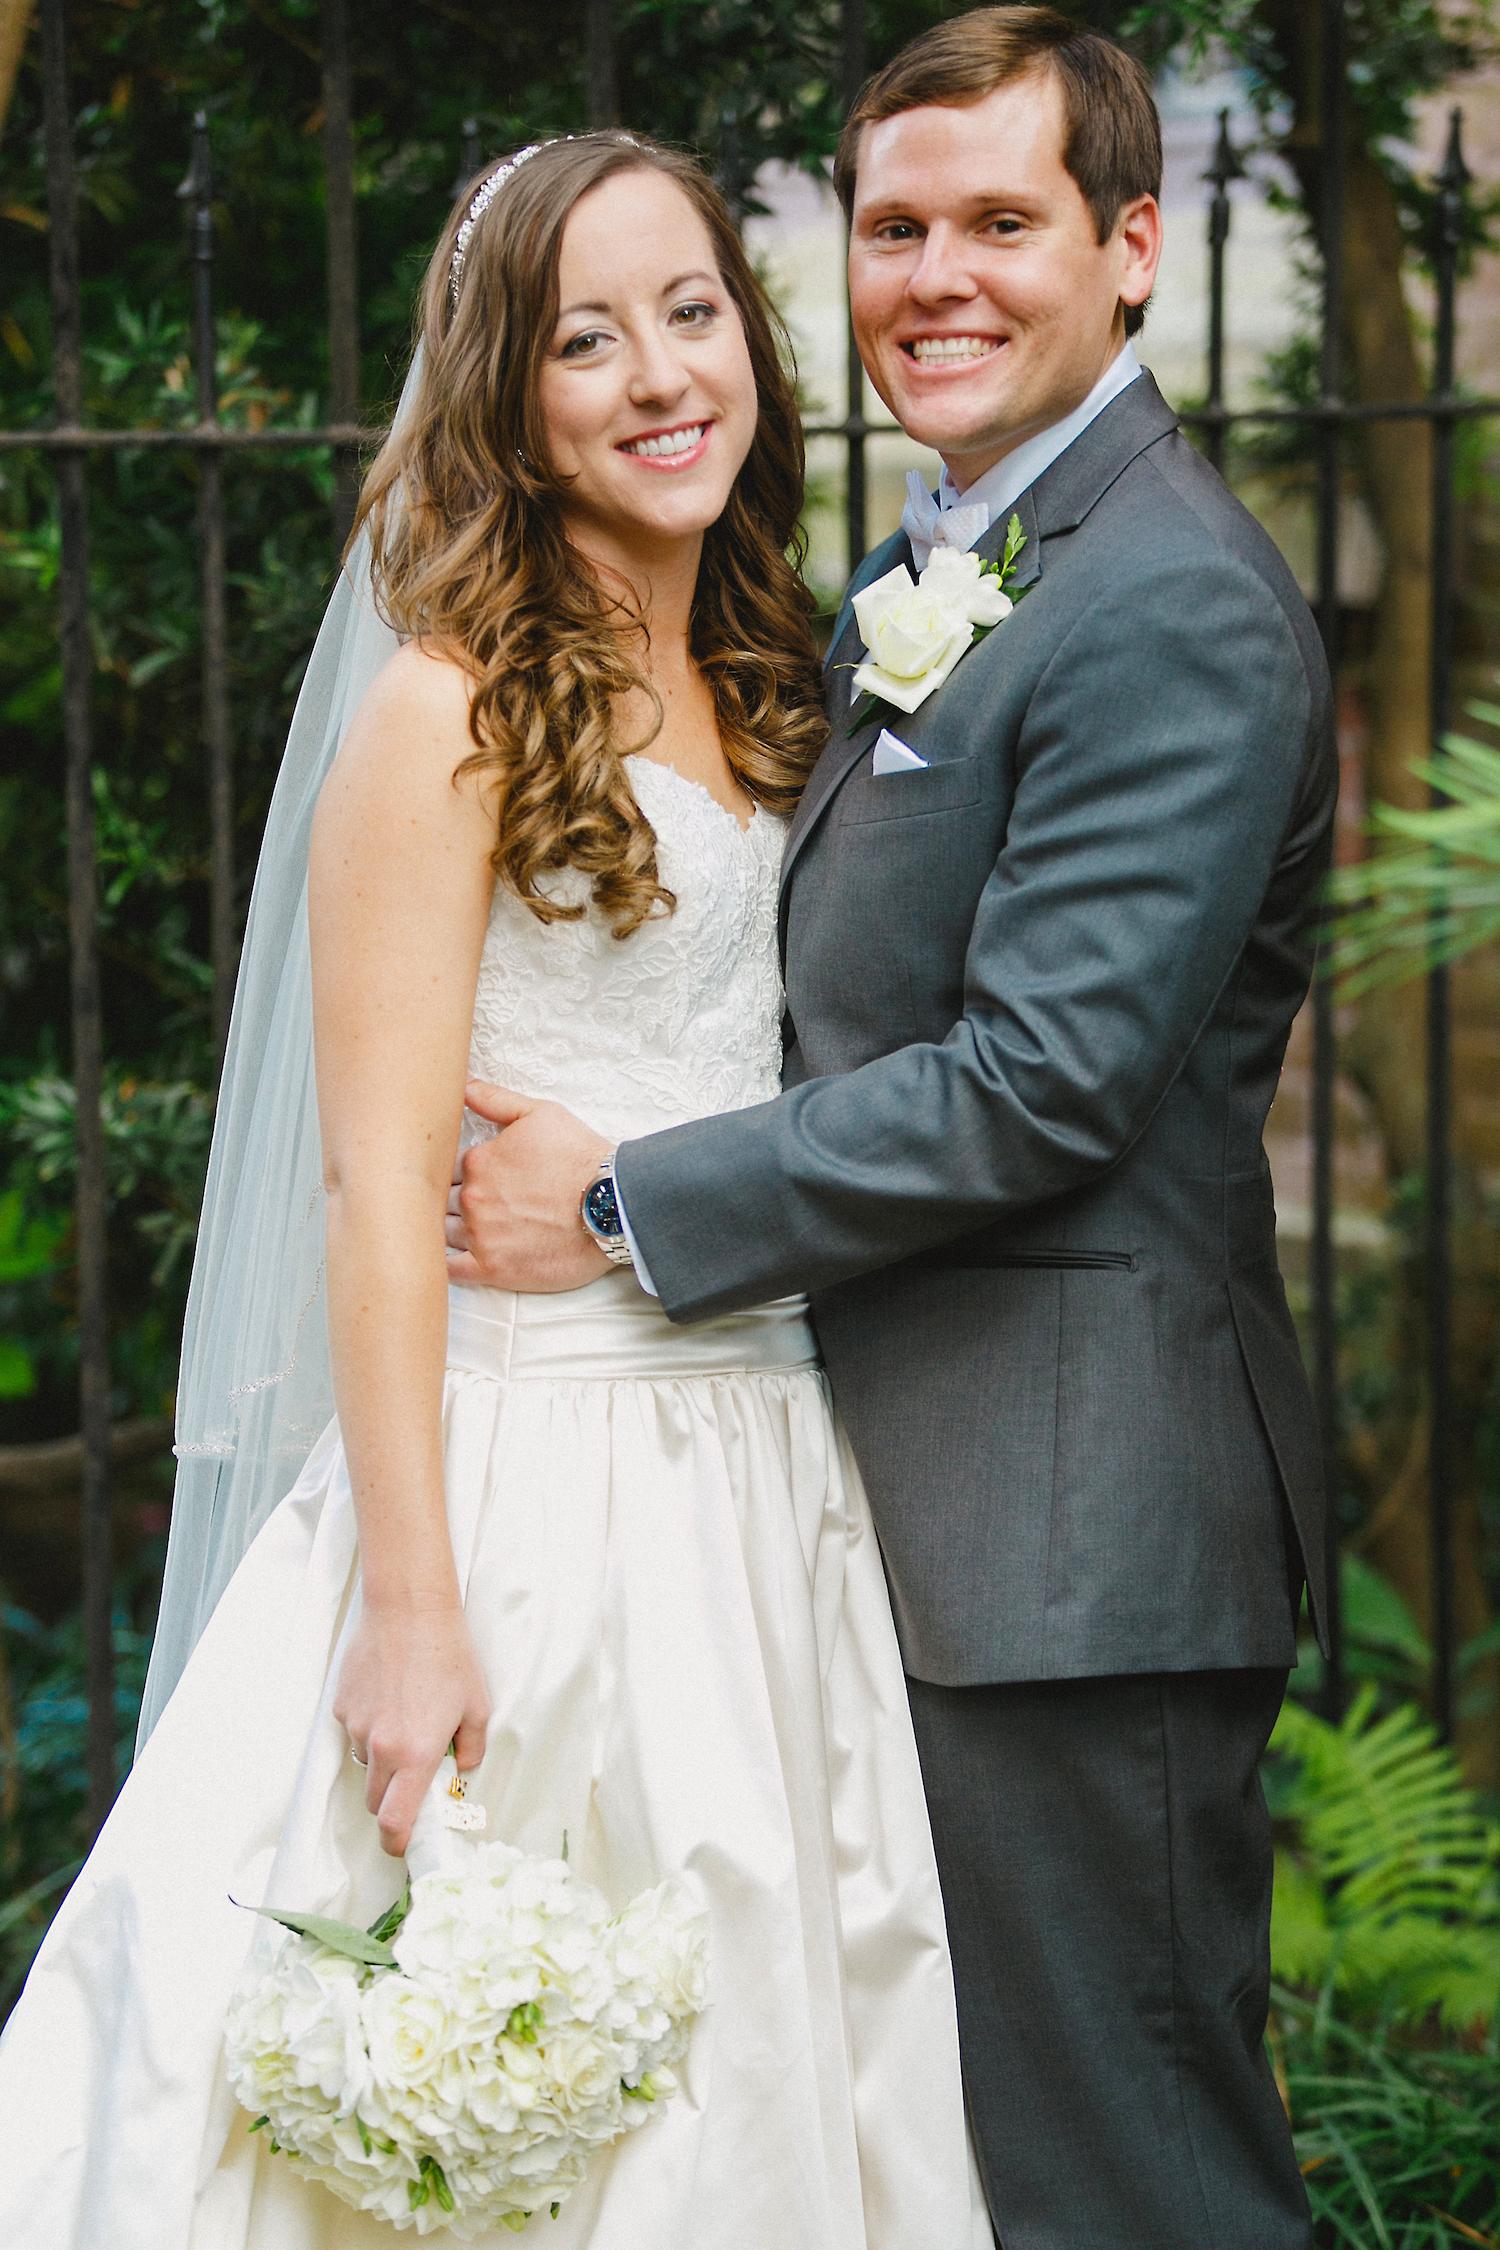 Signature Wedding Erica Martin And Michael Brown Inregister